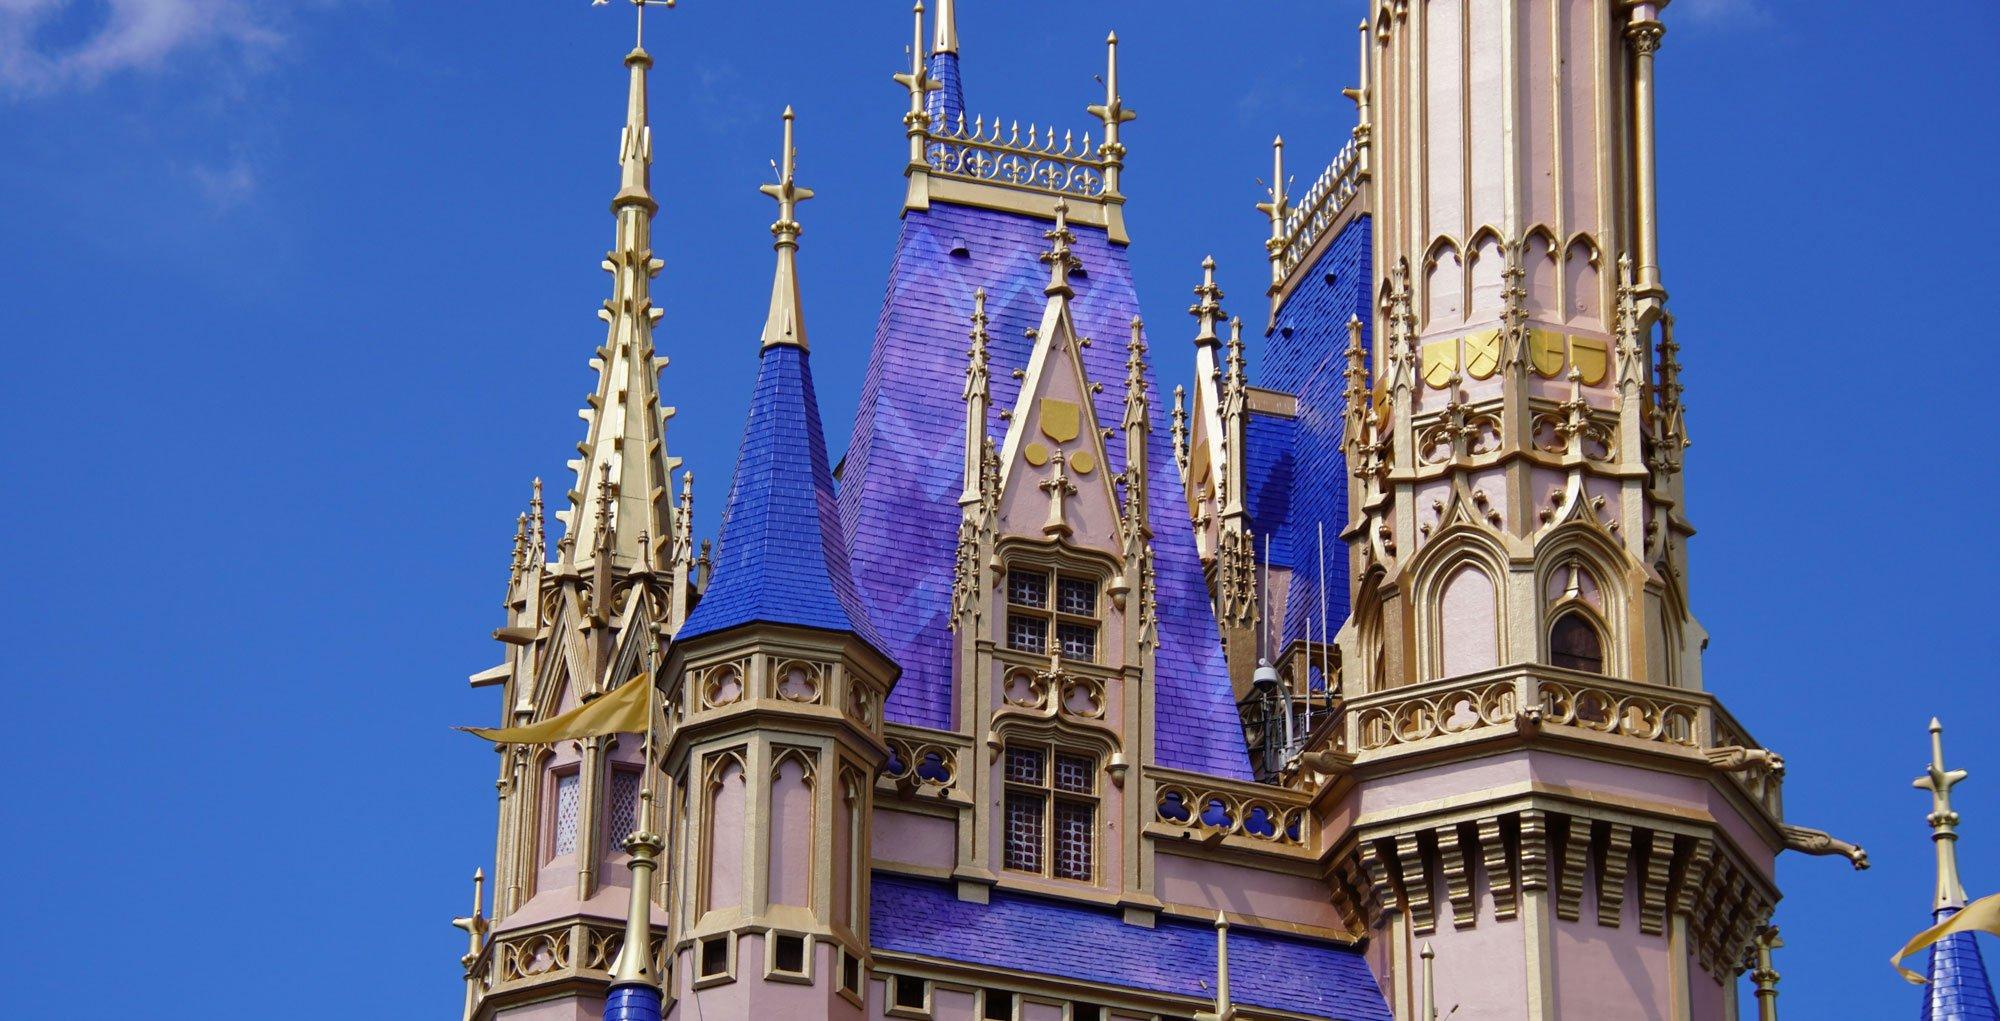 Cinderella Castle 50th Anniversary Paint Job Revamp